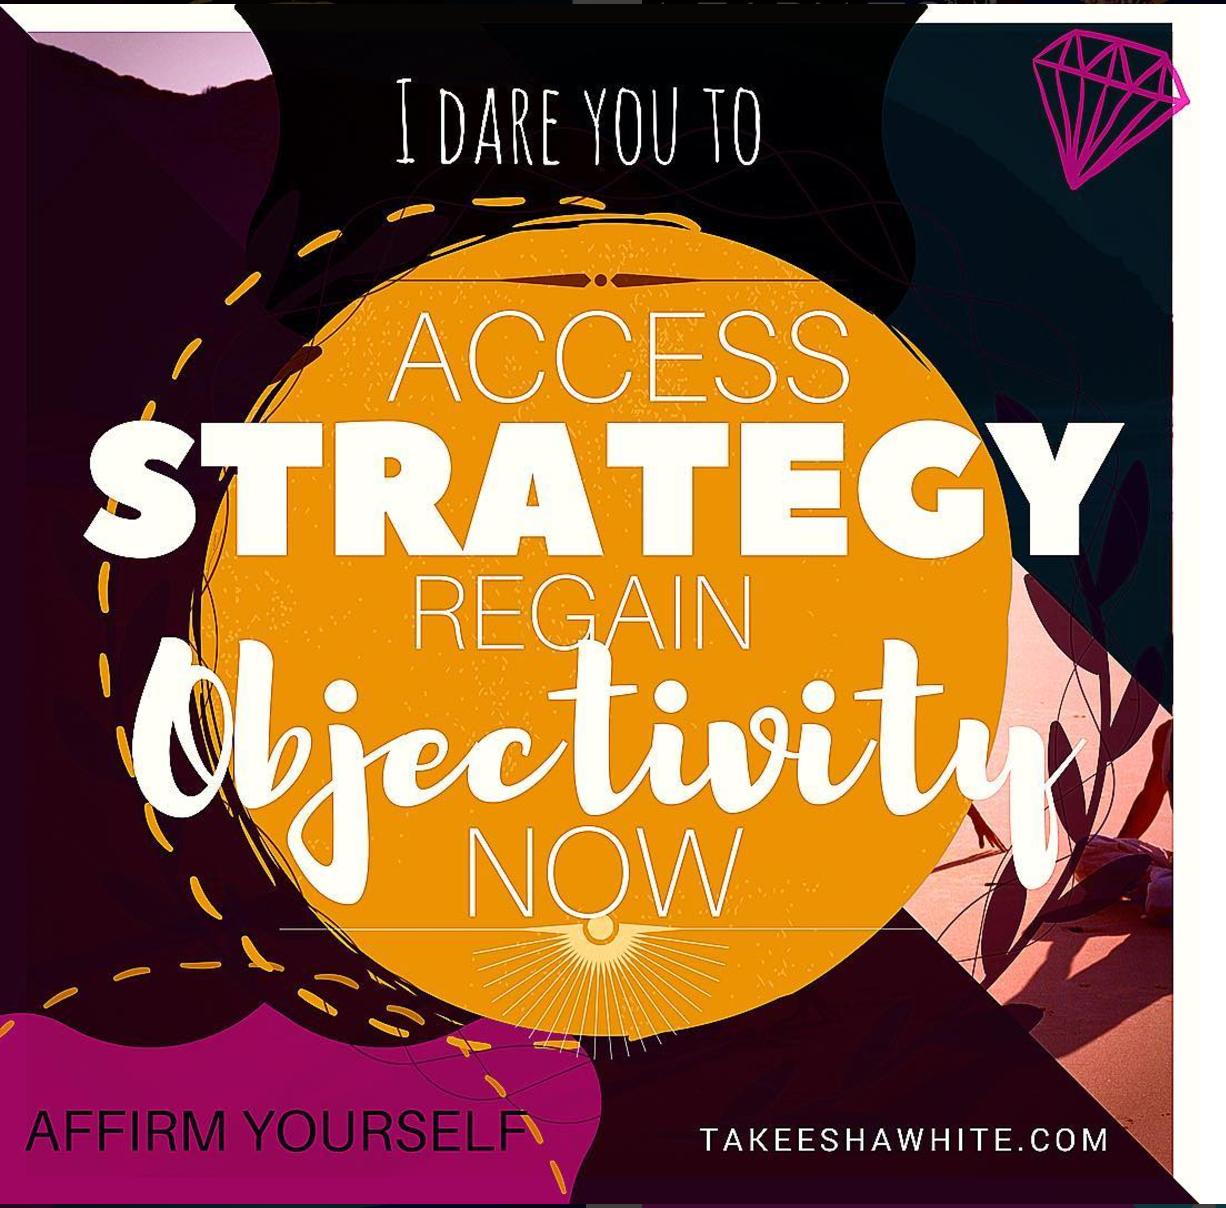 Access Strategy Regain Objectivity